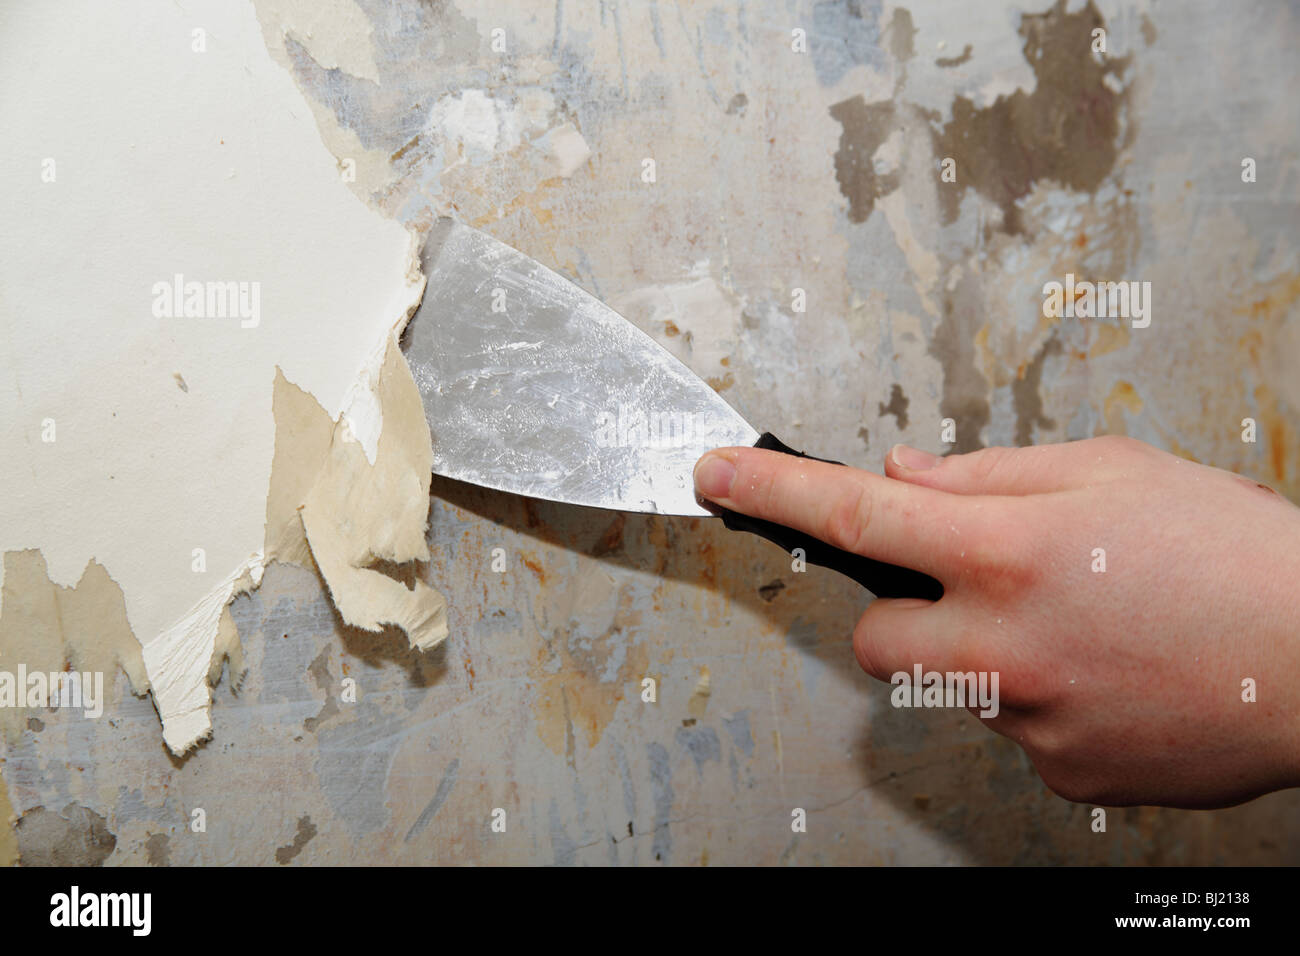 Stripping Wallpaper Stock Photo 28318956